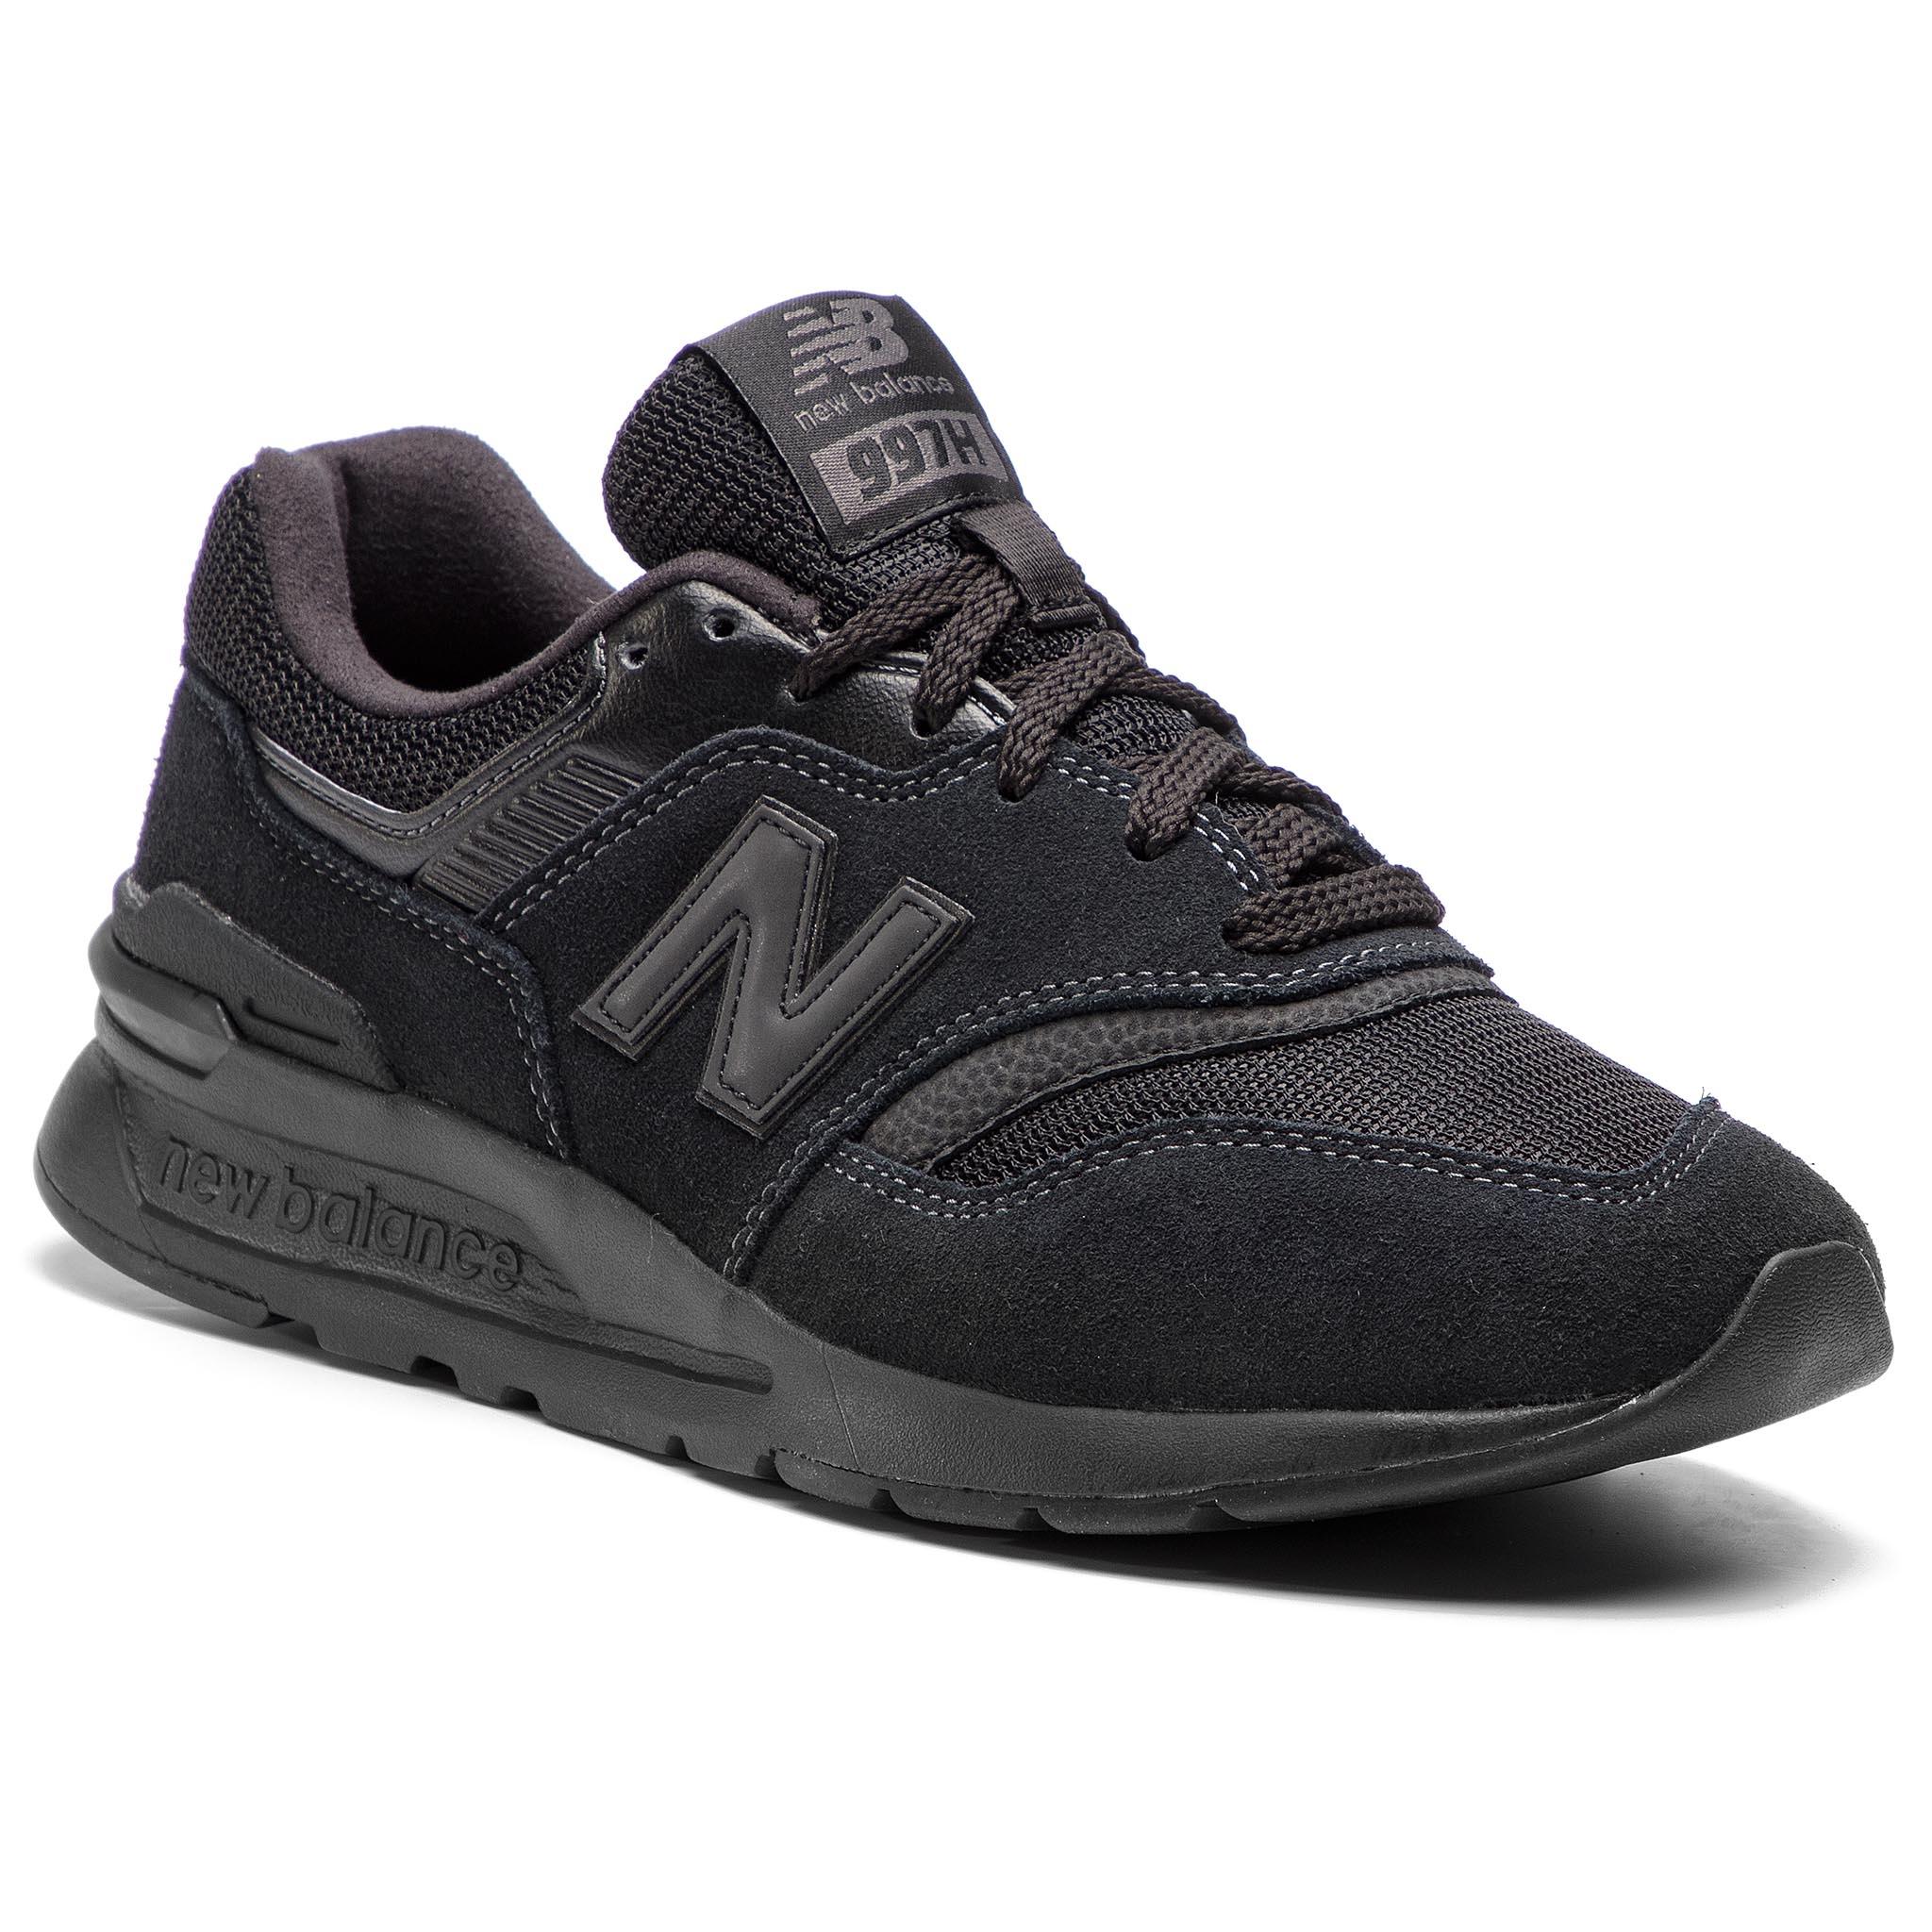 8c99364728 Men's shoes, men's footwear – see the newest models on efootwear.eu ...